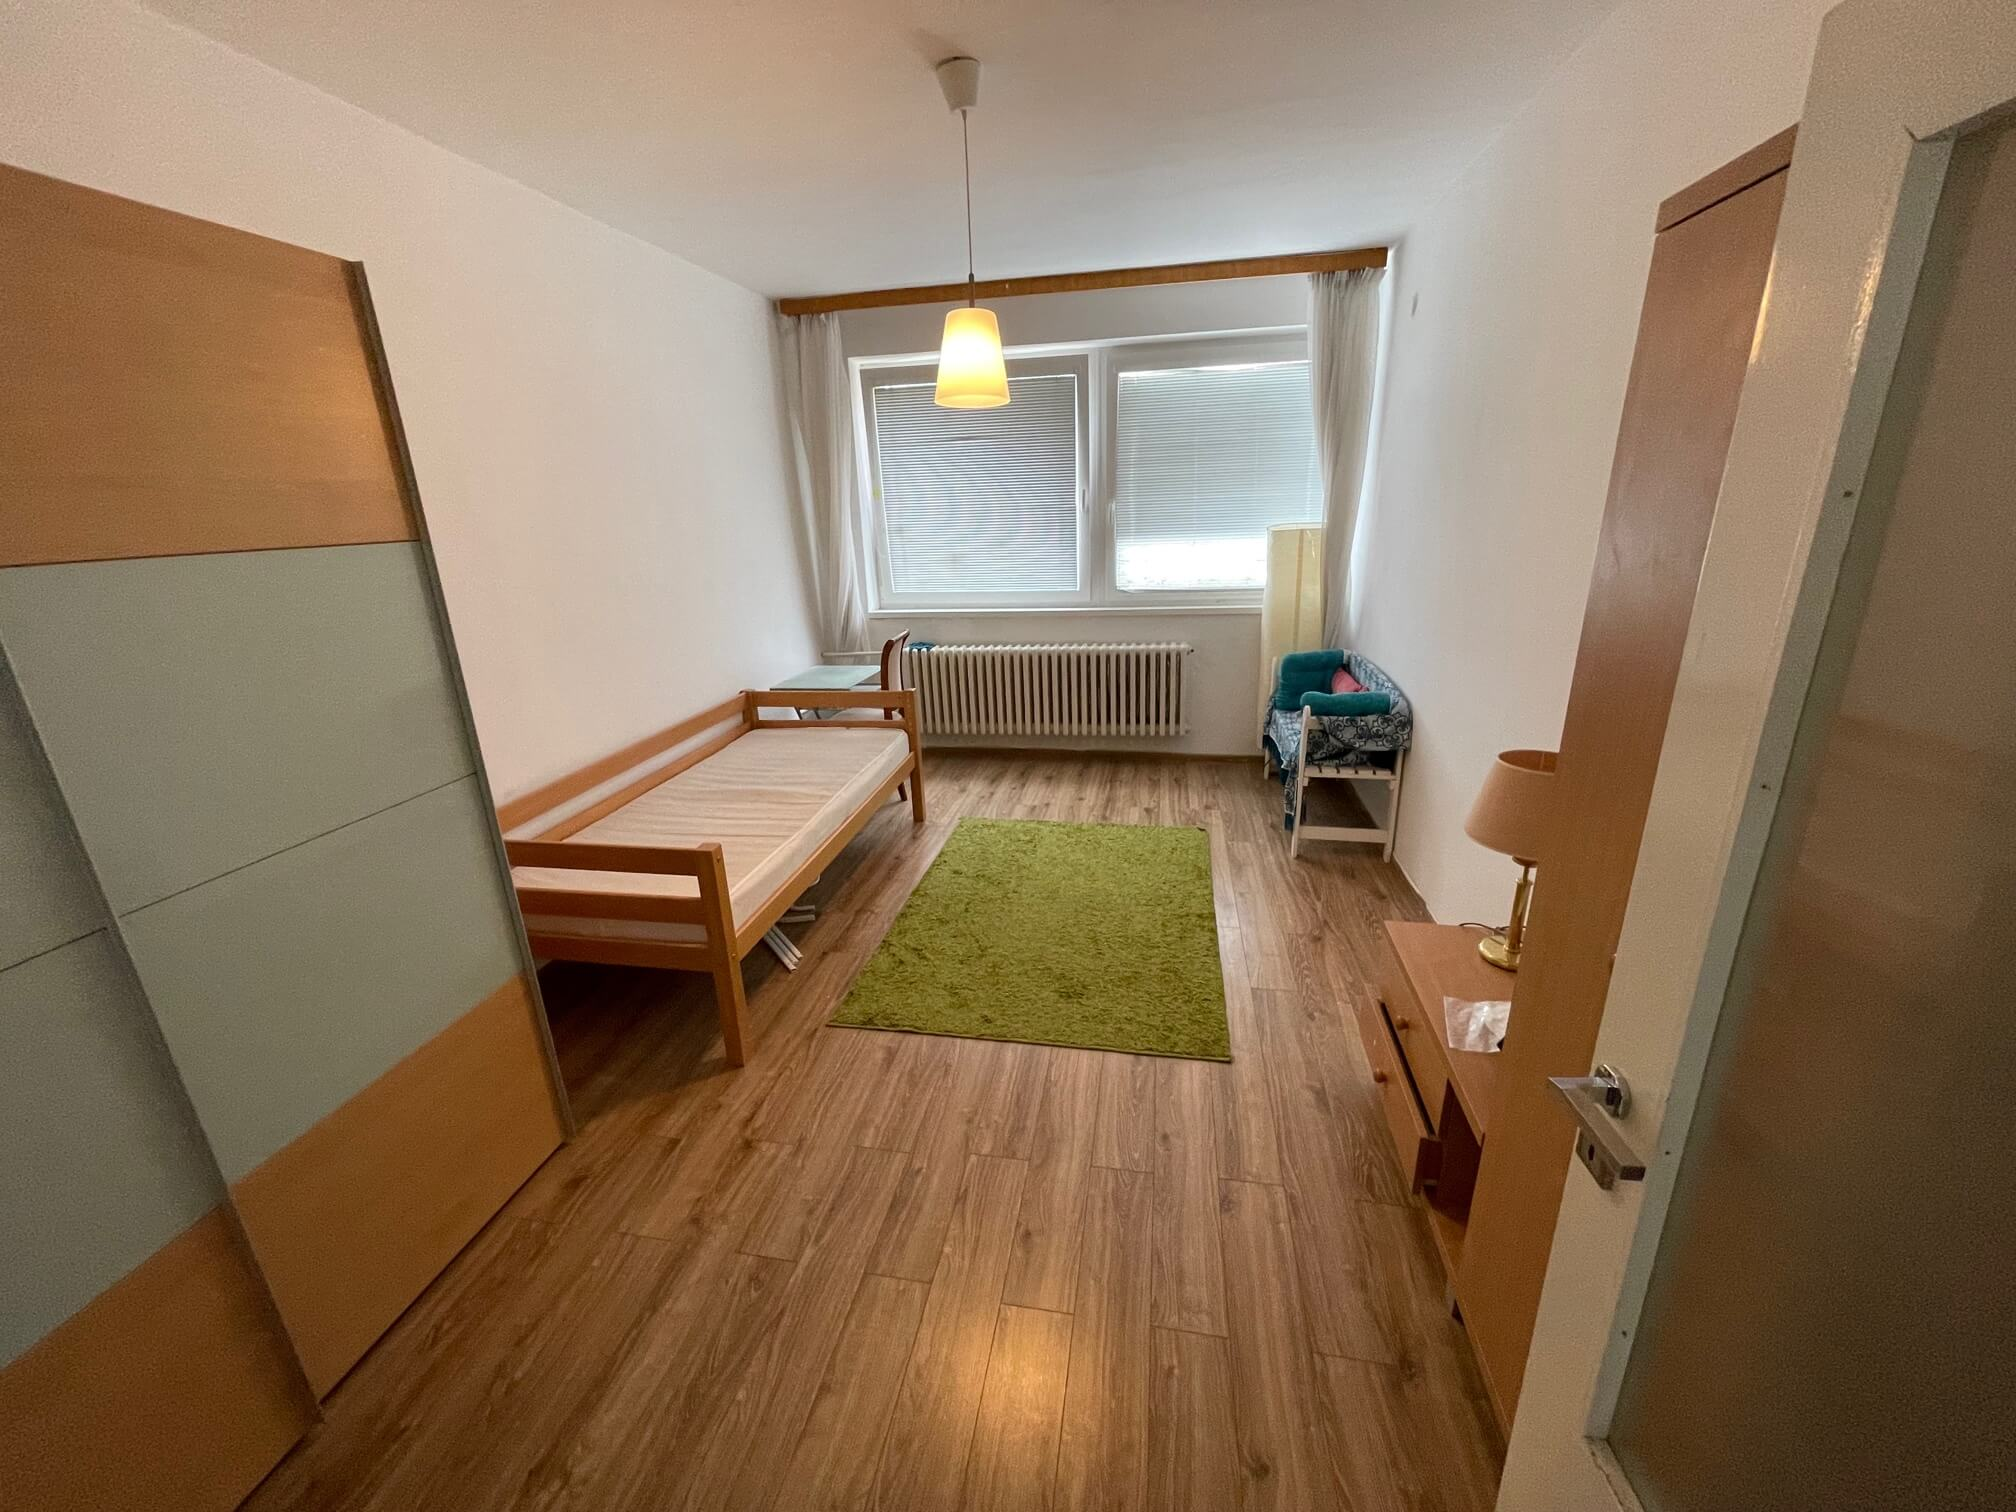 Exkluzívne na prenájom 3 izbový byt, 83m2, 2x loggia 4,5m2, Karolovka, Janotová 8-11